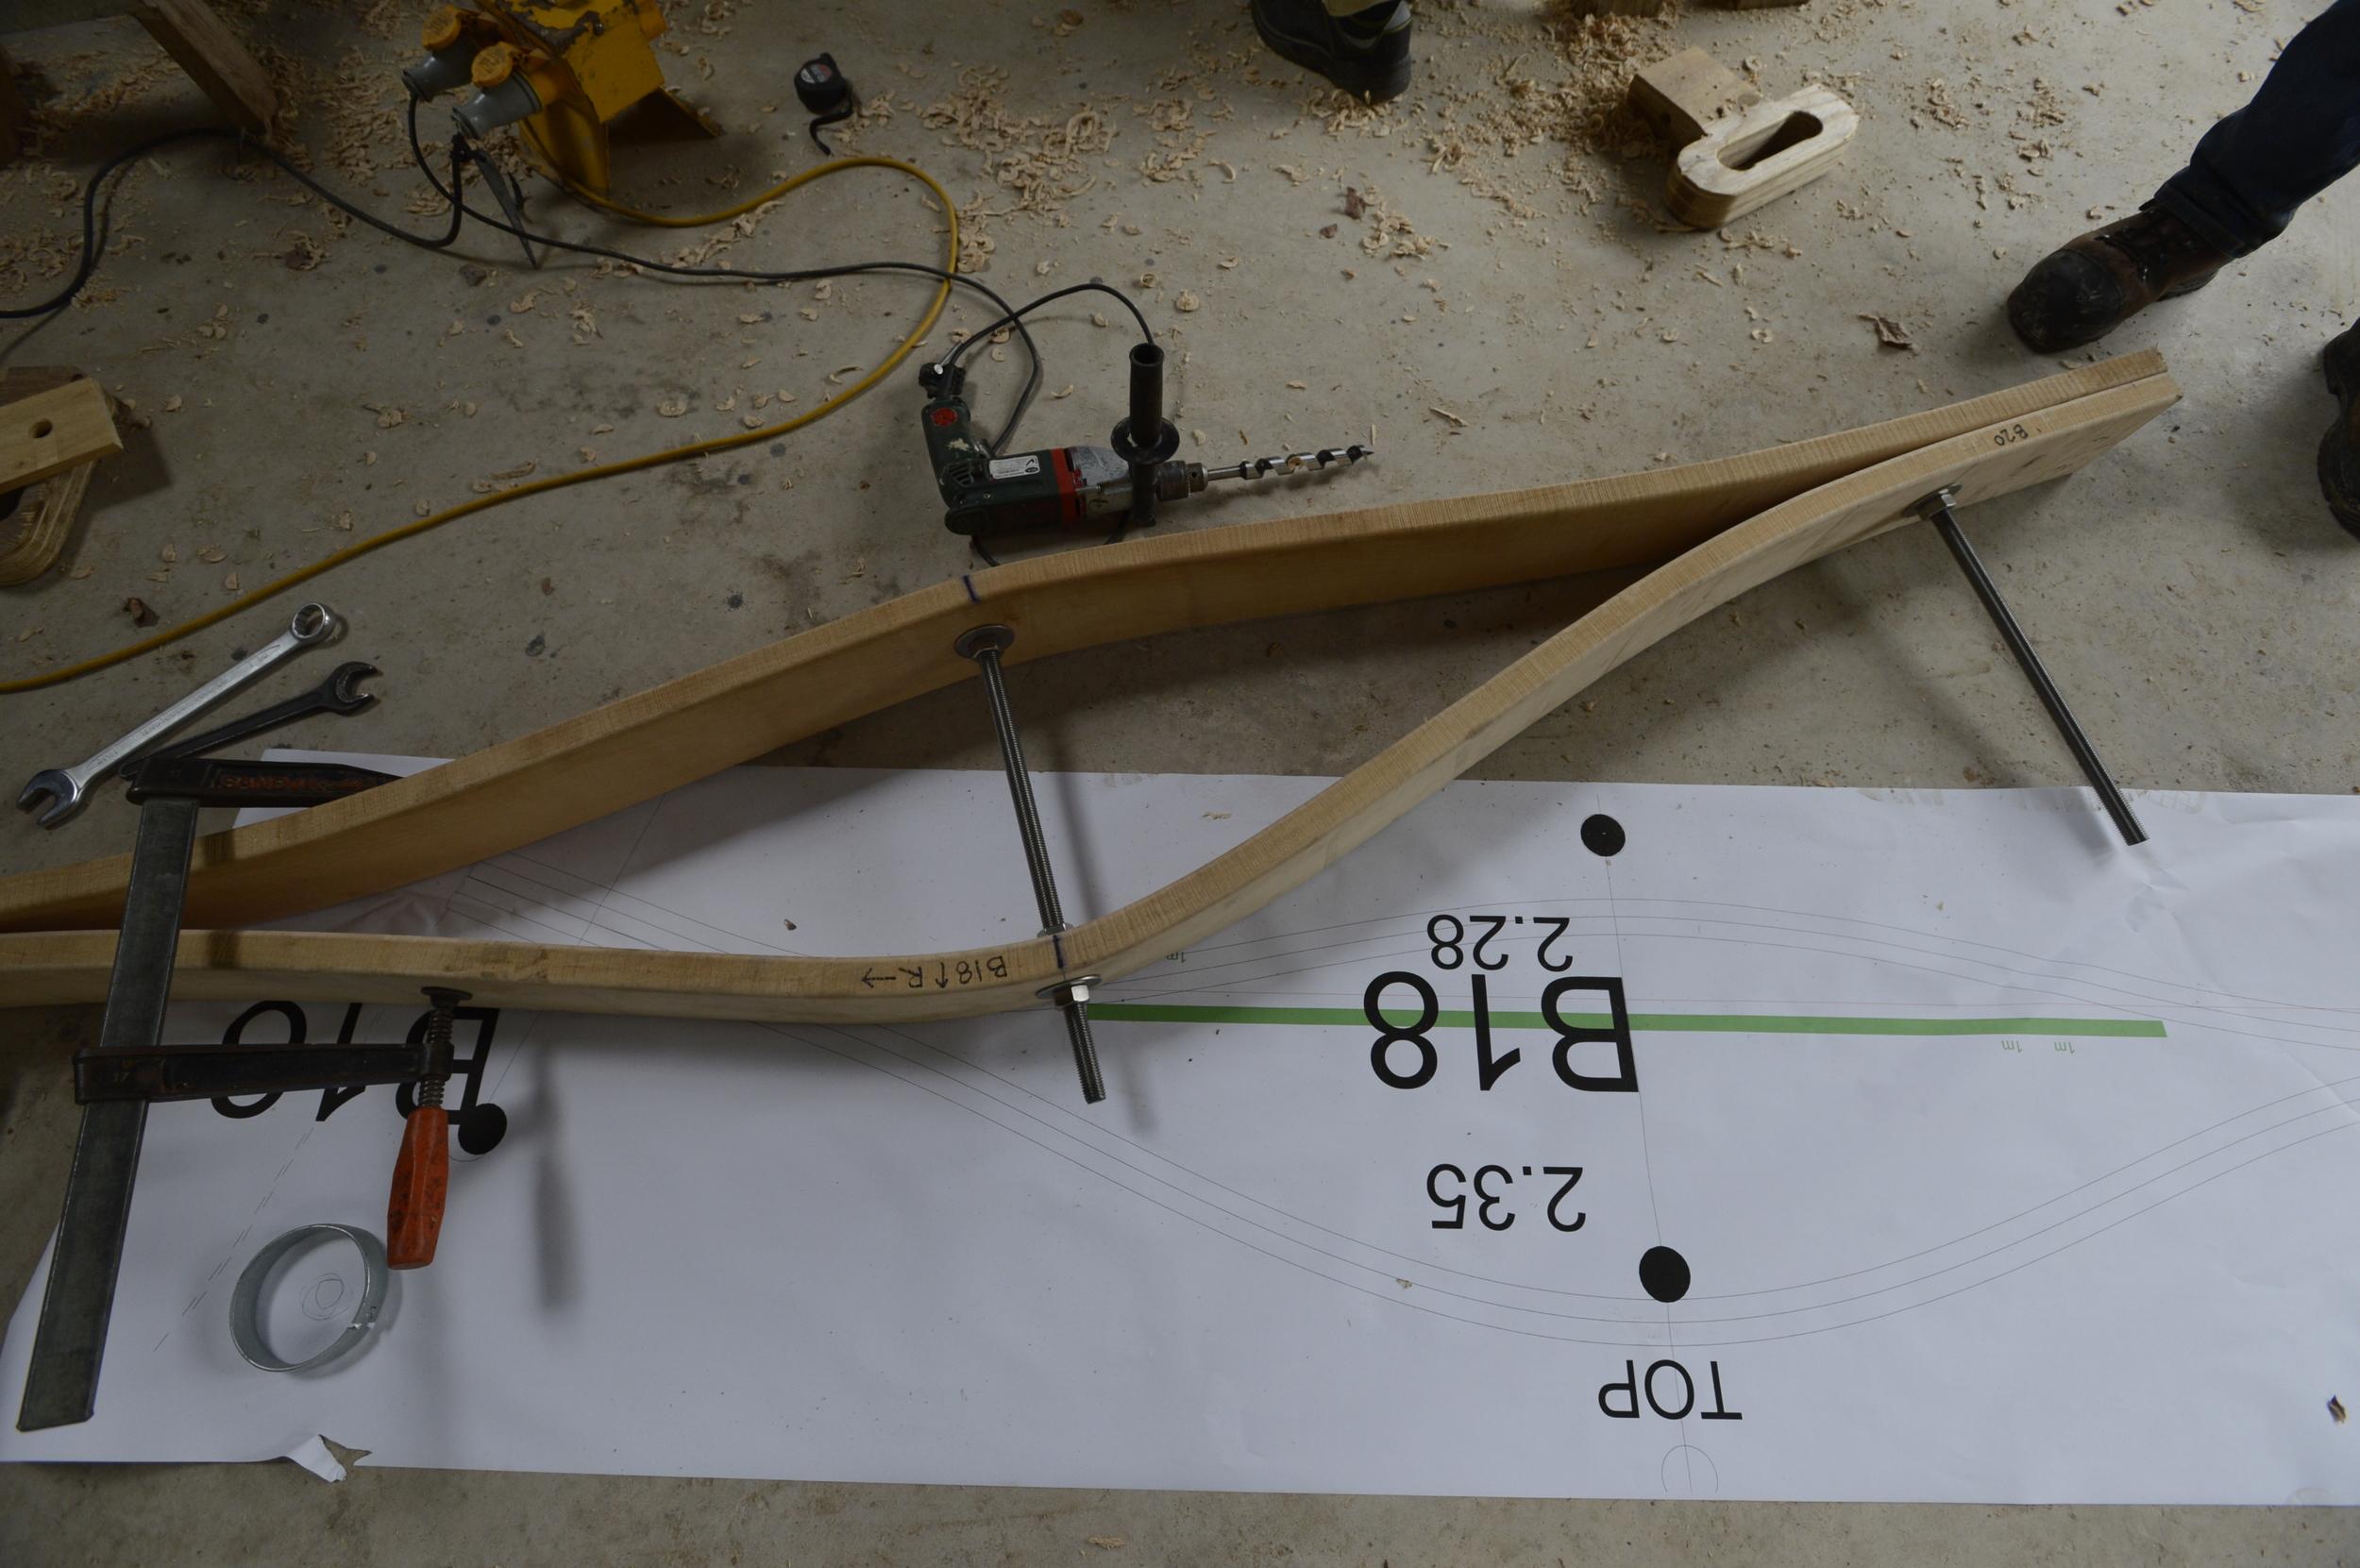 Hooke_Park_Design_&_Make_Timber_Seasoning_Shelter_bending_wood_on_the_jig_VB_2013_07_29_0089.JPG